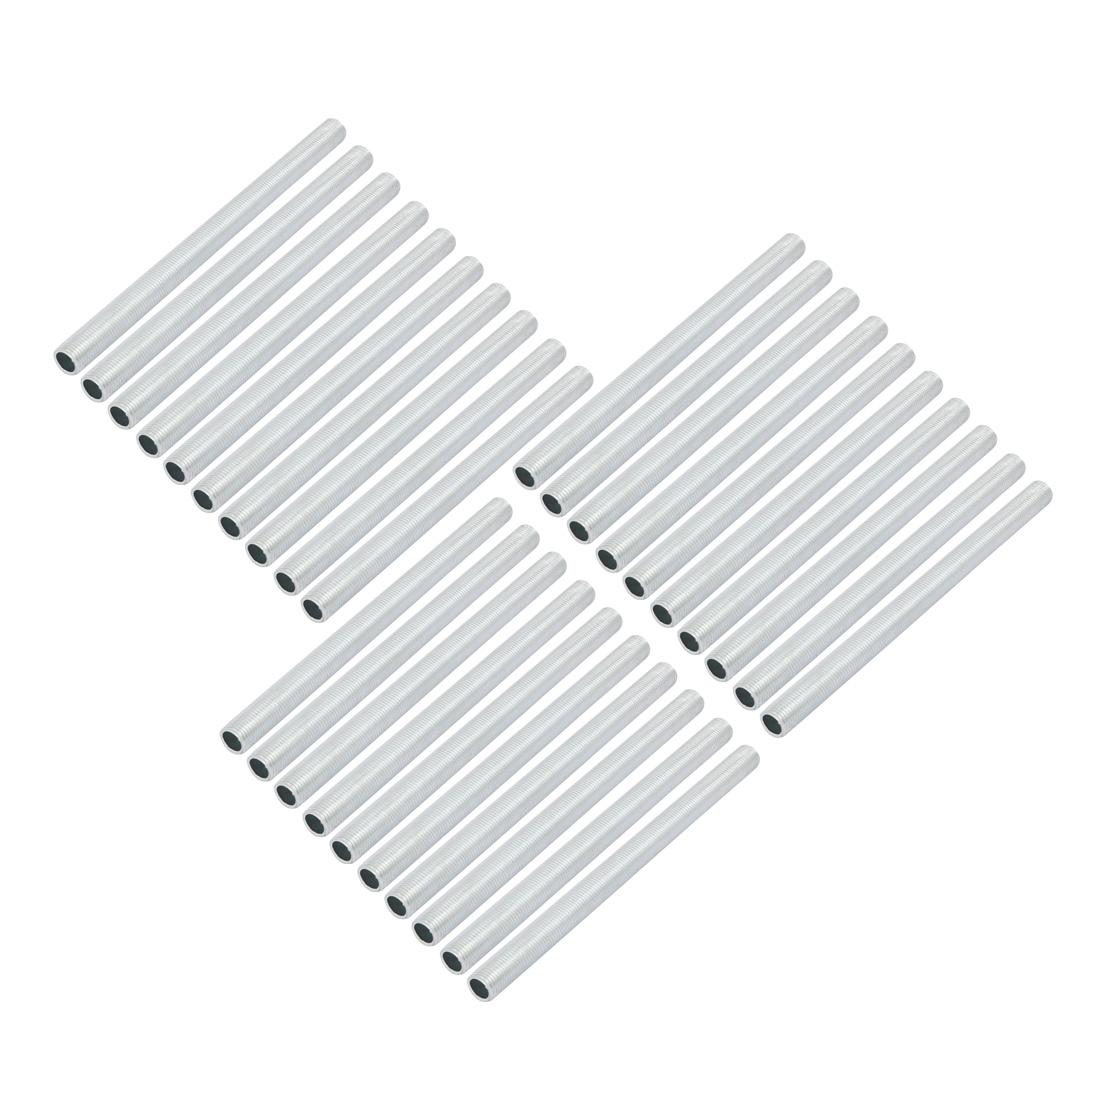 30 Pcs Metric M10 1mm Pitch Thread Zinc Plated Pipe Nipple Lamp Parts 140mm Long